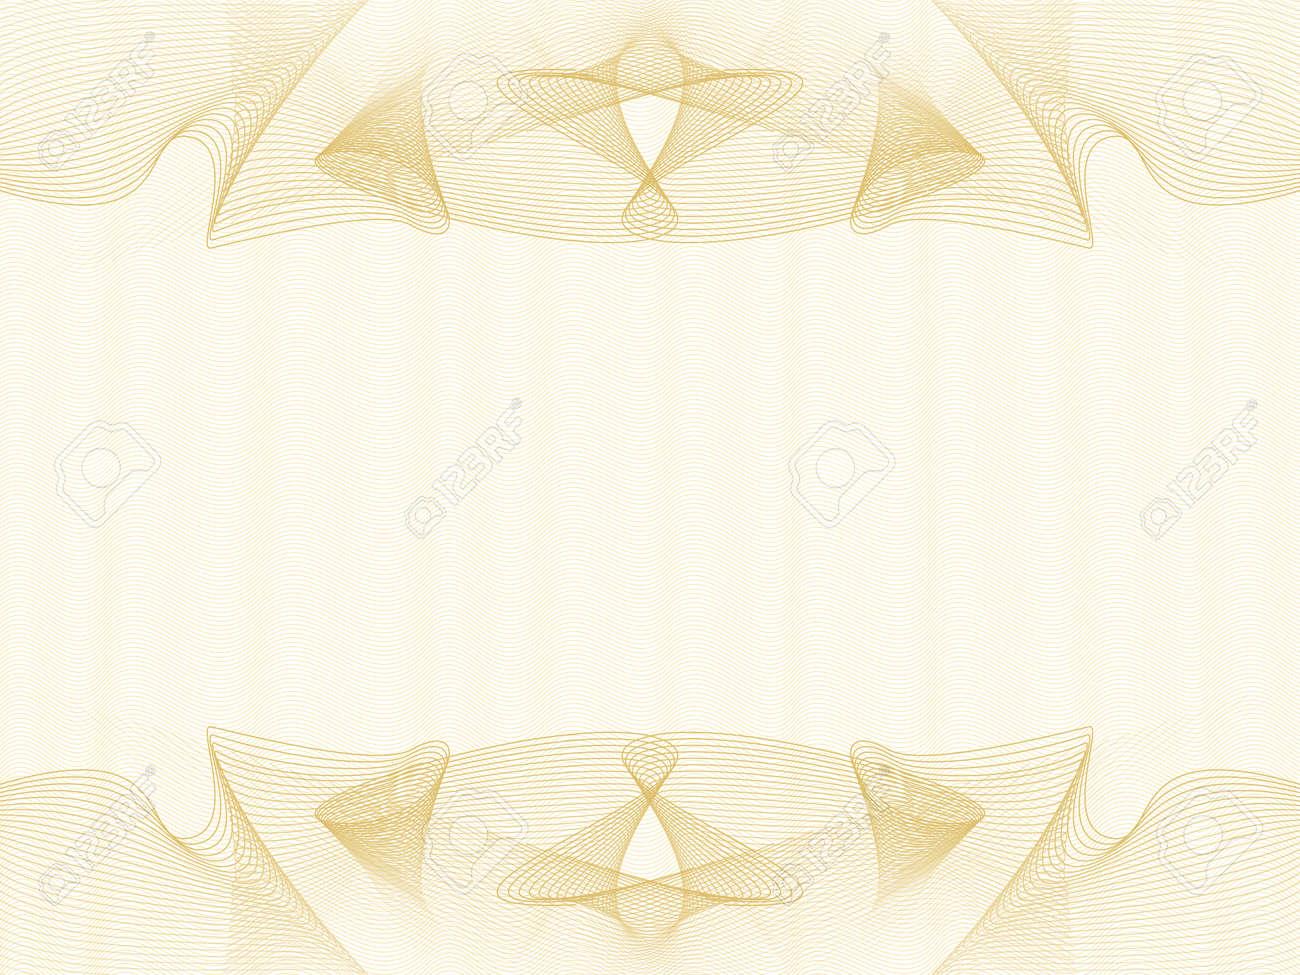 Stylish golden line art background for certificate, diploma, passport, gift card. Elegant vignette design. Pastel abstract watermark, guilloche pattern. Vector draped net. Template A4, landscape orientation. illustration - 159446270